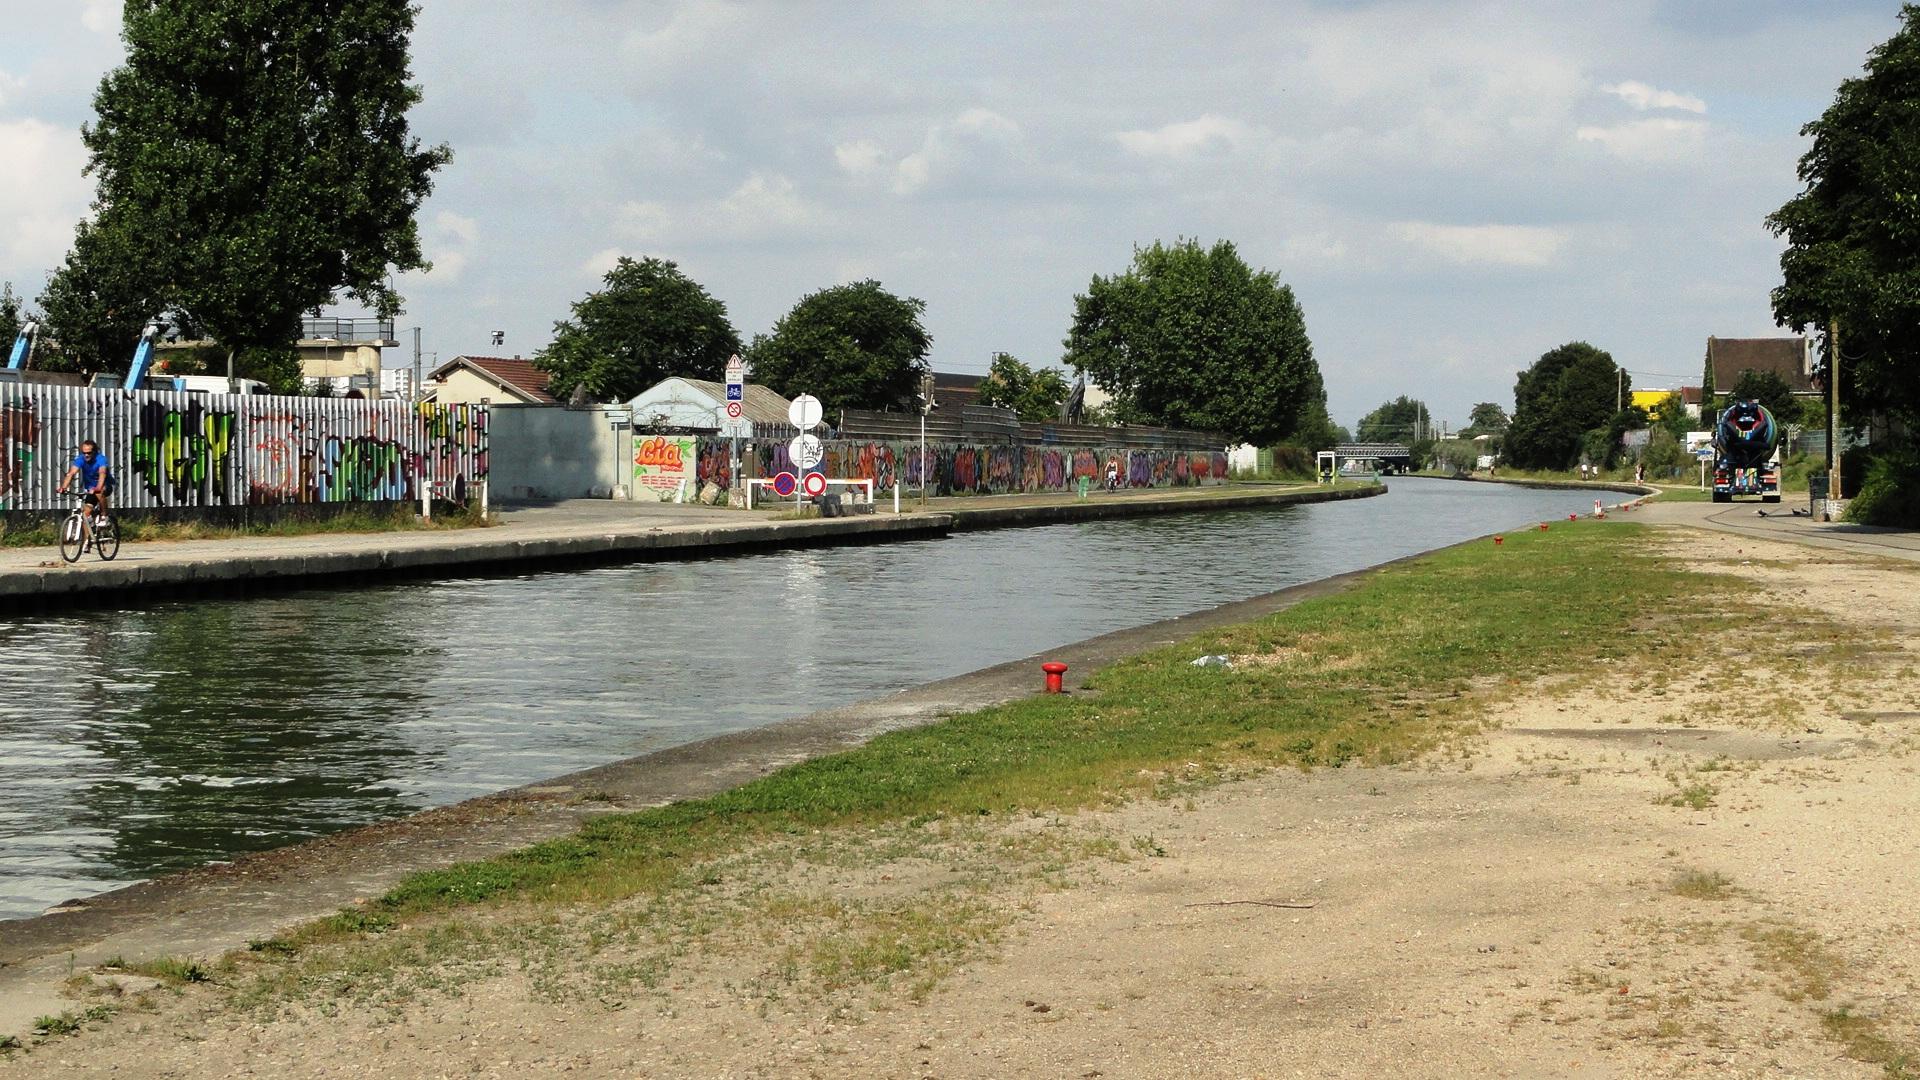 Canal de l'Ourcq - Chemin de halage - Bobigny